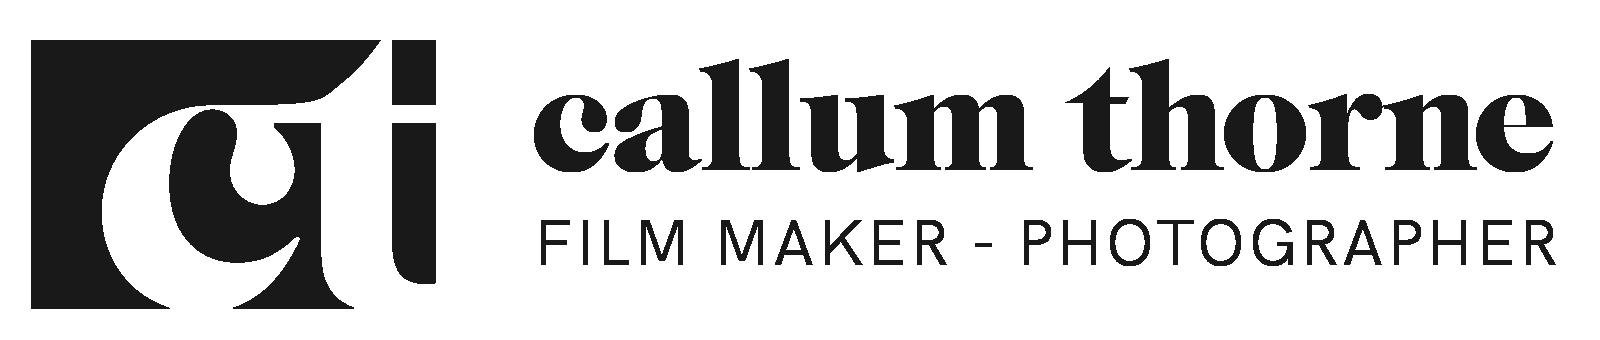 callum-thorne-logo-horizontal-dark.png